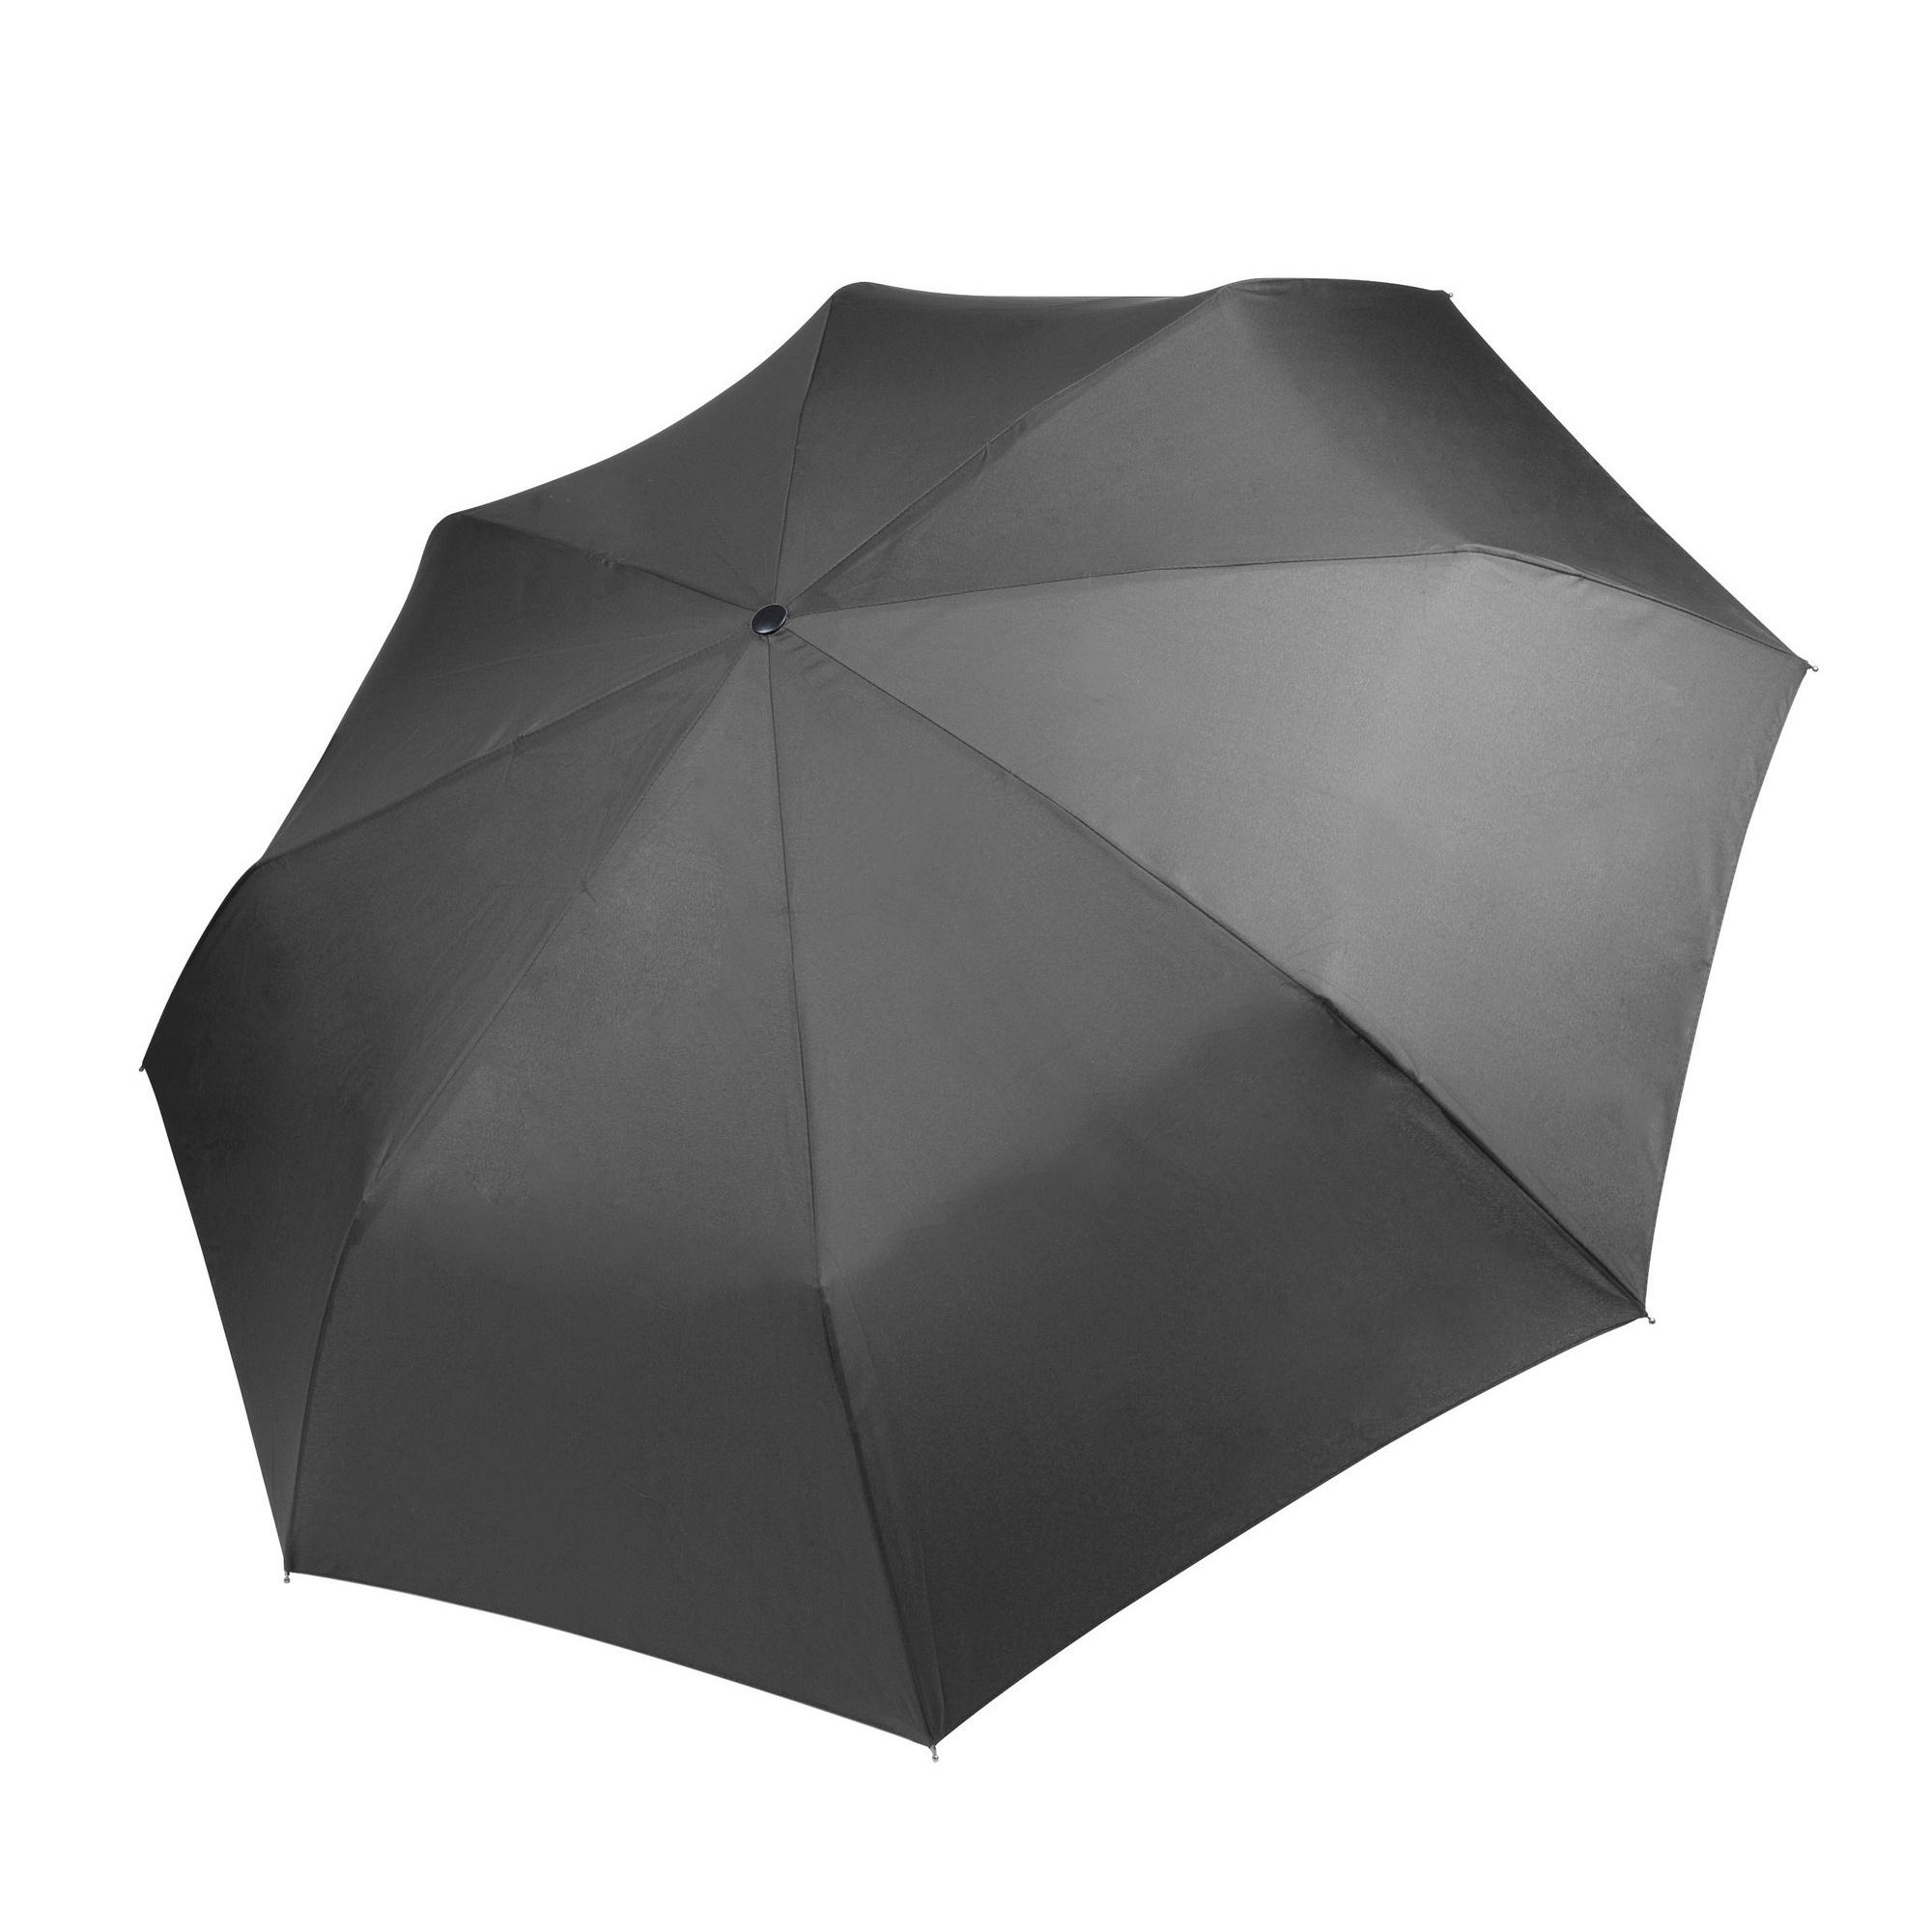 Kimood Foldable Handbag Umbrella (Pack of 2) (One Size) (Dark Grey)